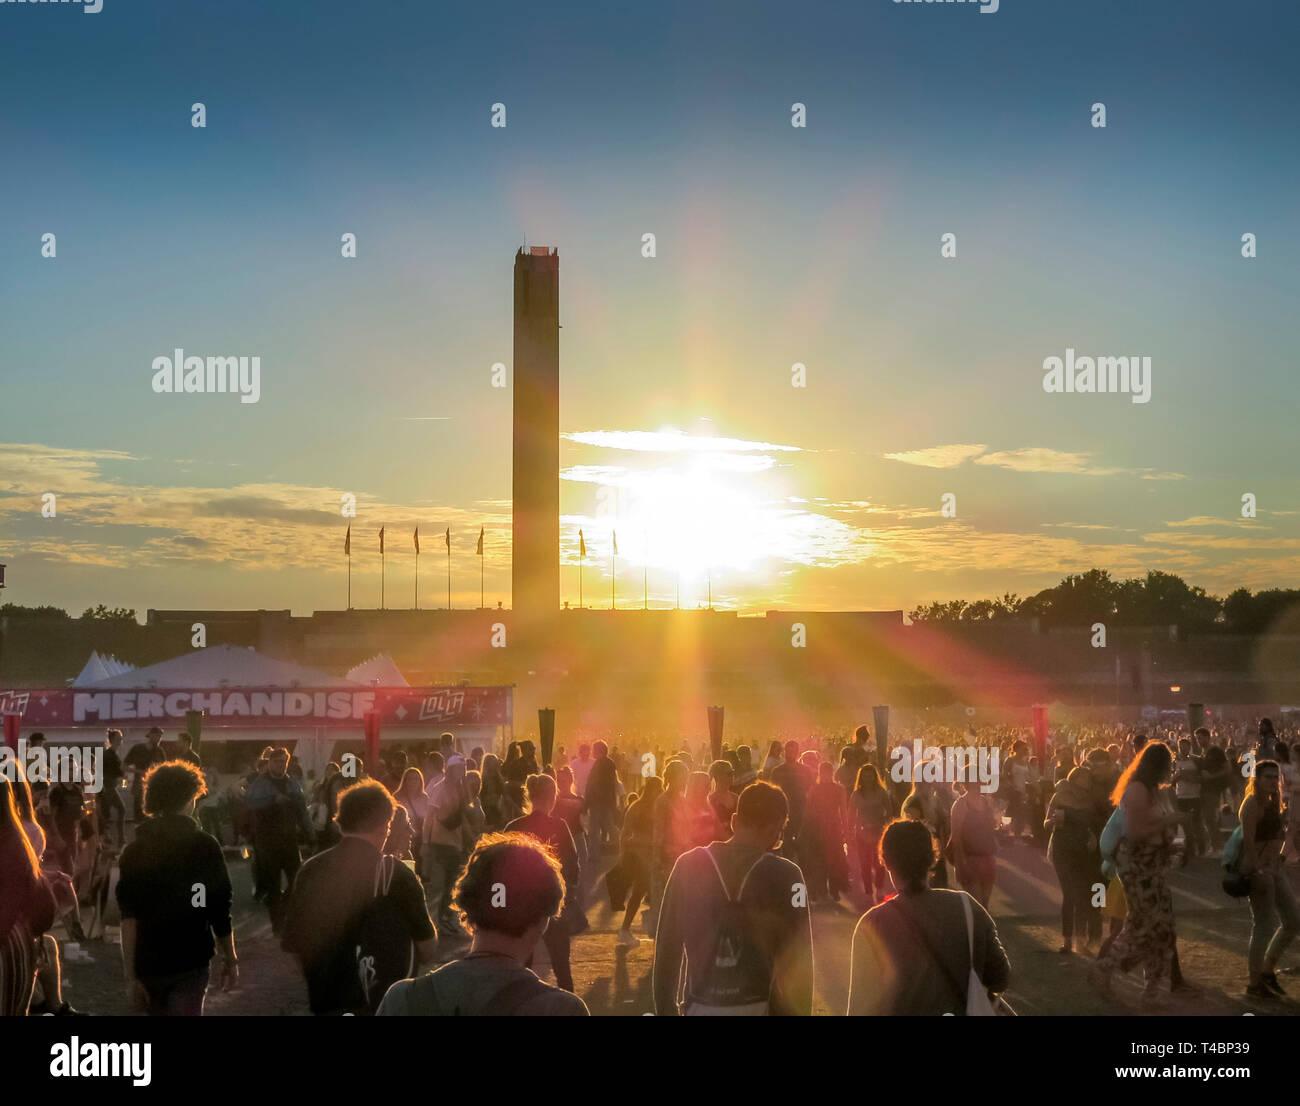 Maifeld, Lollapalooza-Festival, Olympiastadion, Westend, Berlin, Deutschland - Stock Image